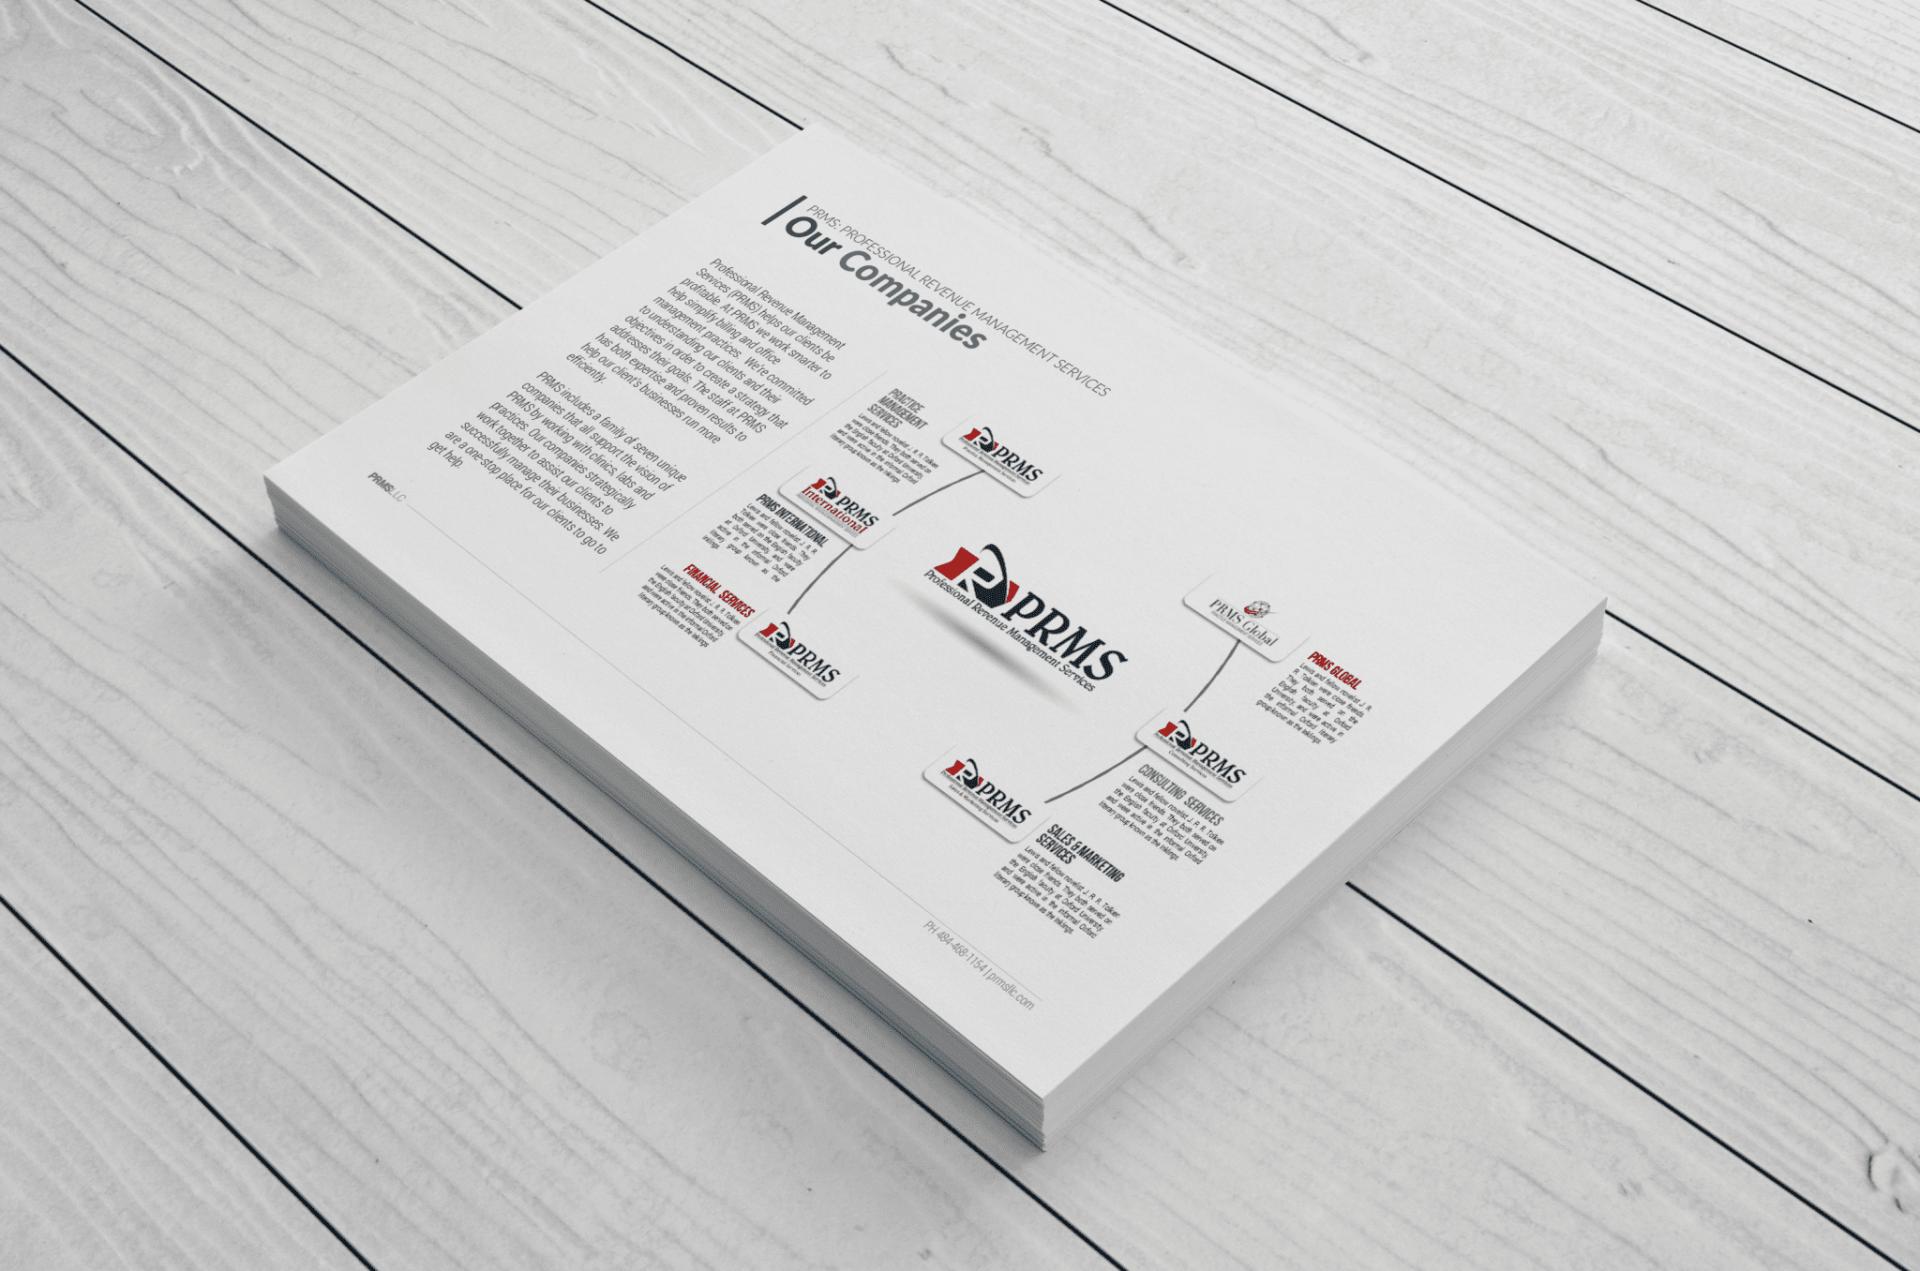 prms global BRANDING NO. 2 – Adoublem Management Solutions